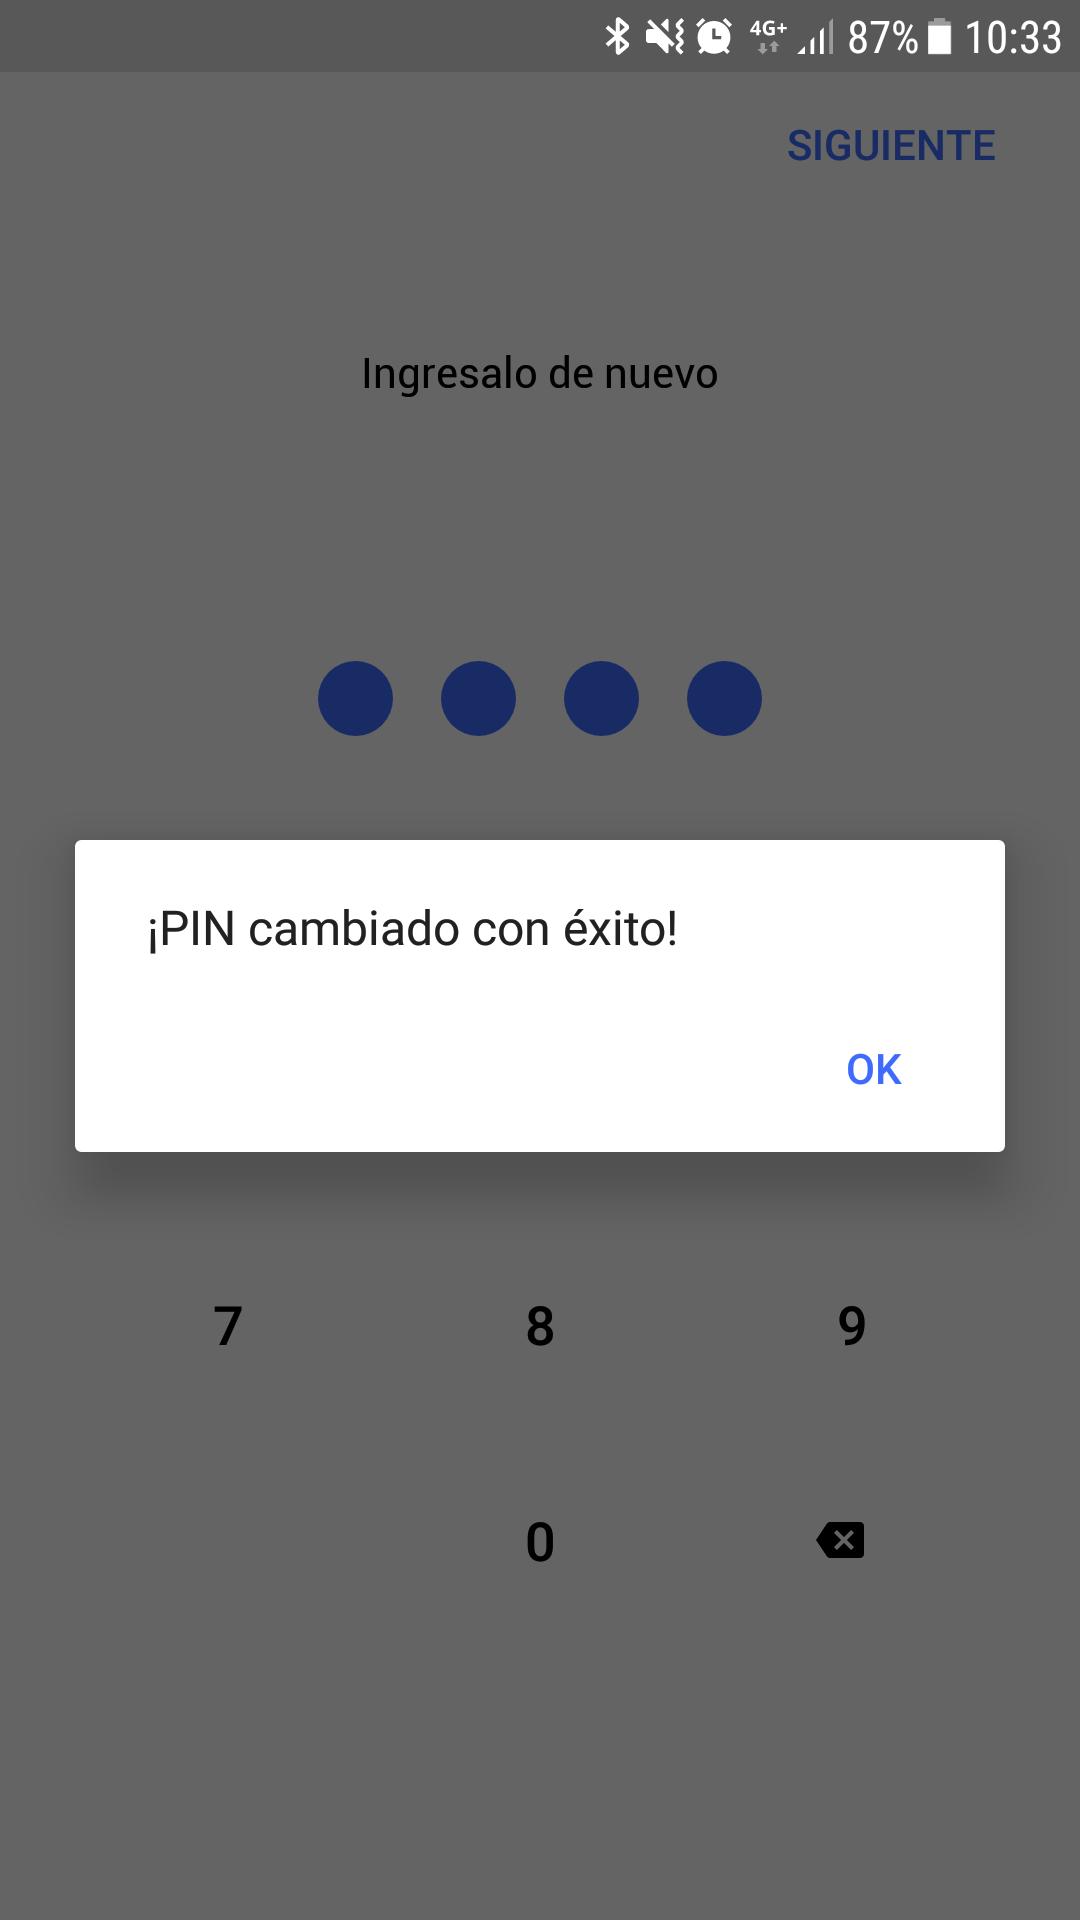 Crear o Modificar Pin de Cajero en Ual App